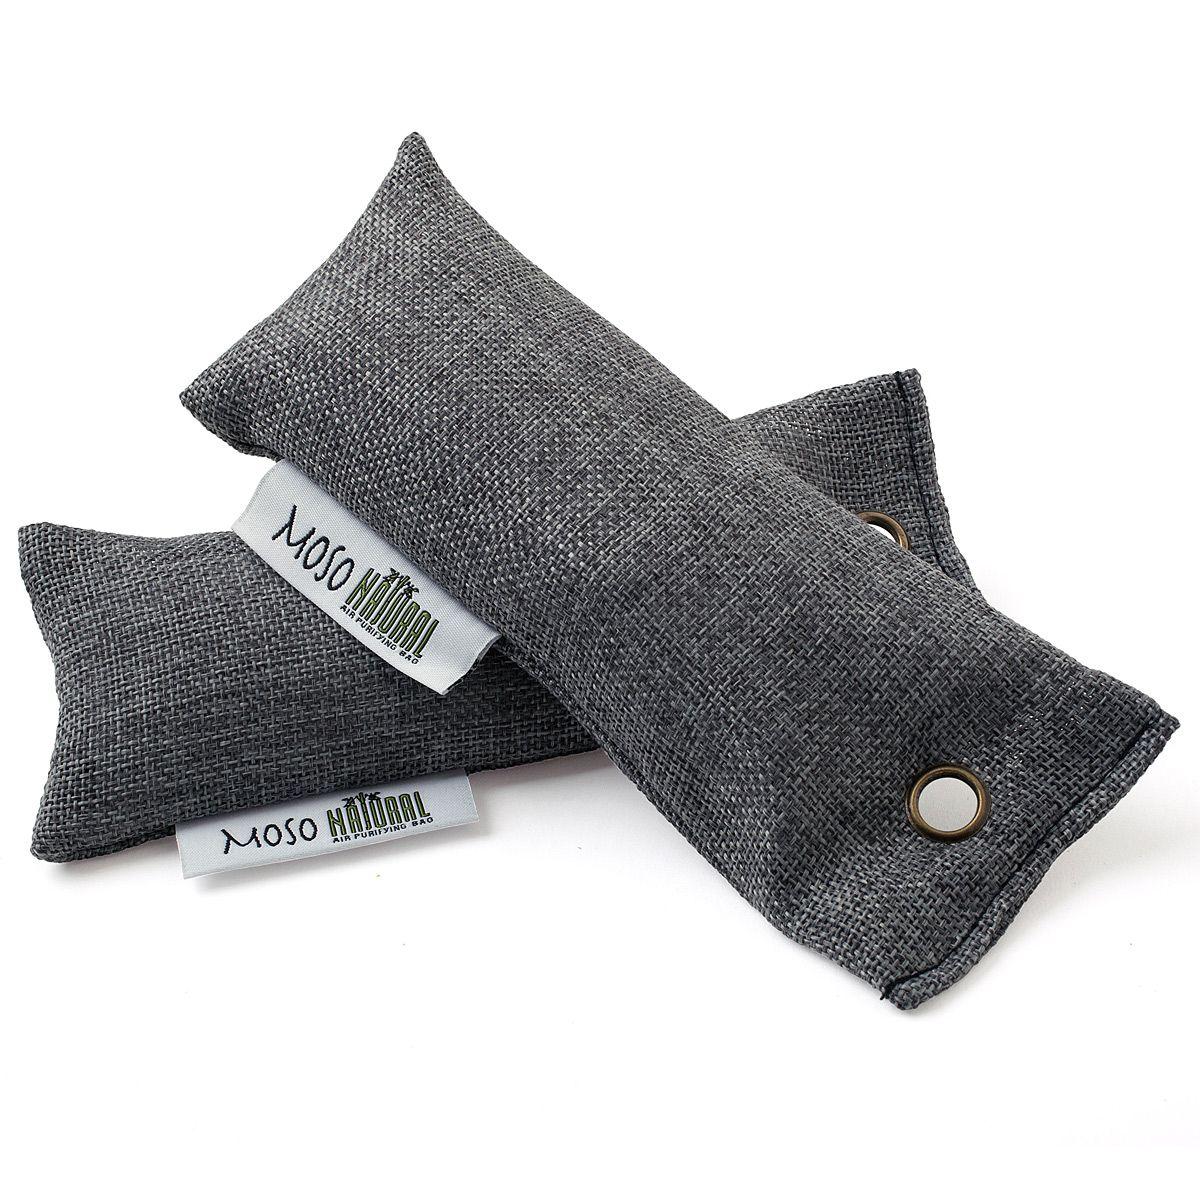 Mini Moso Air Purifying Bags Bamboo Charcoal Air Filter